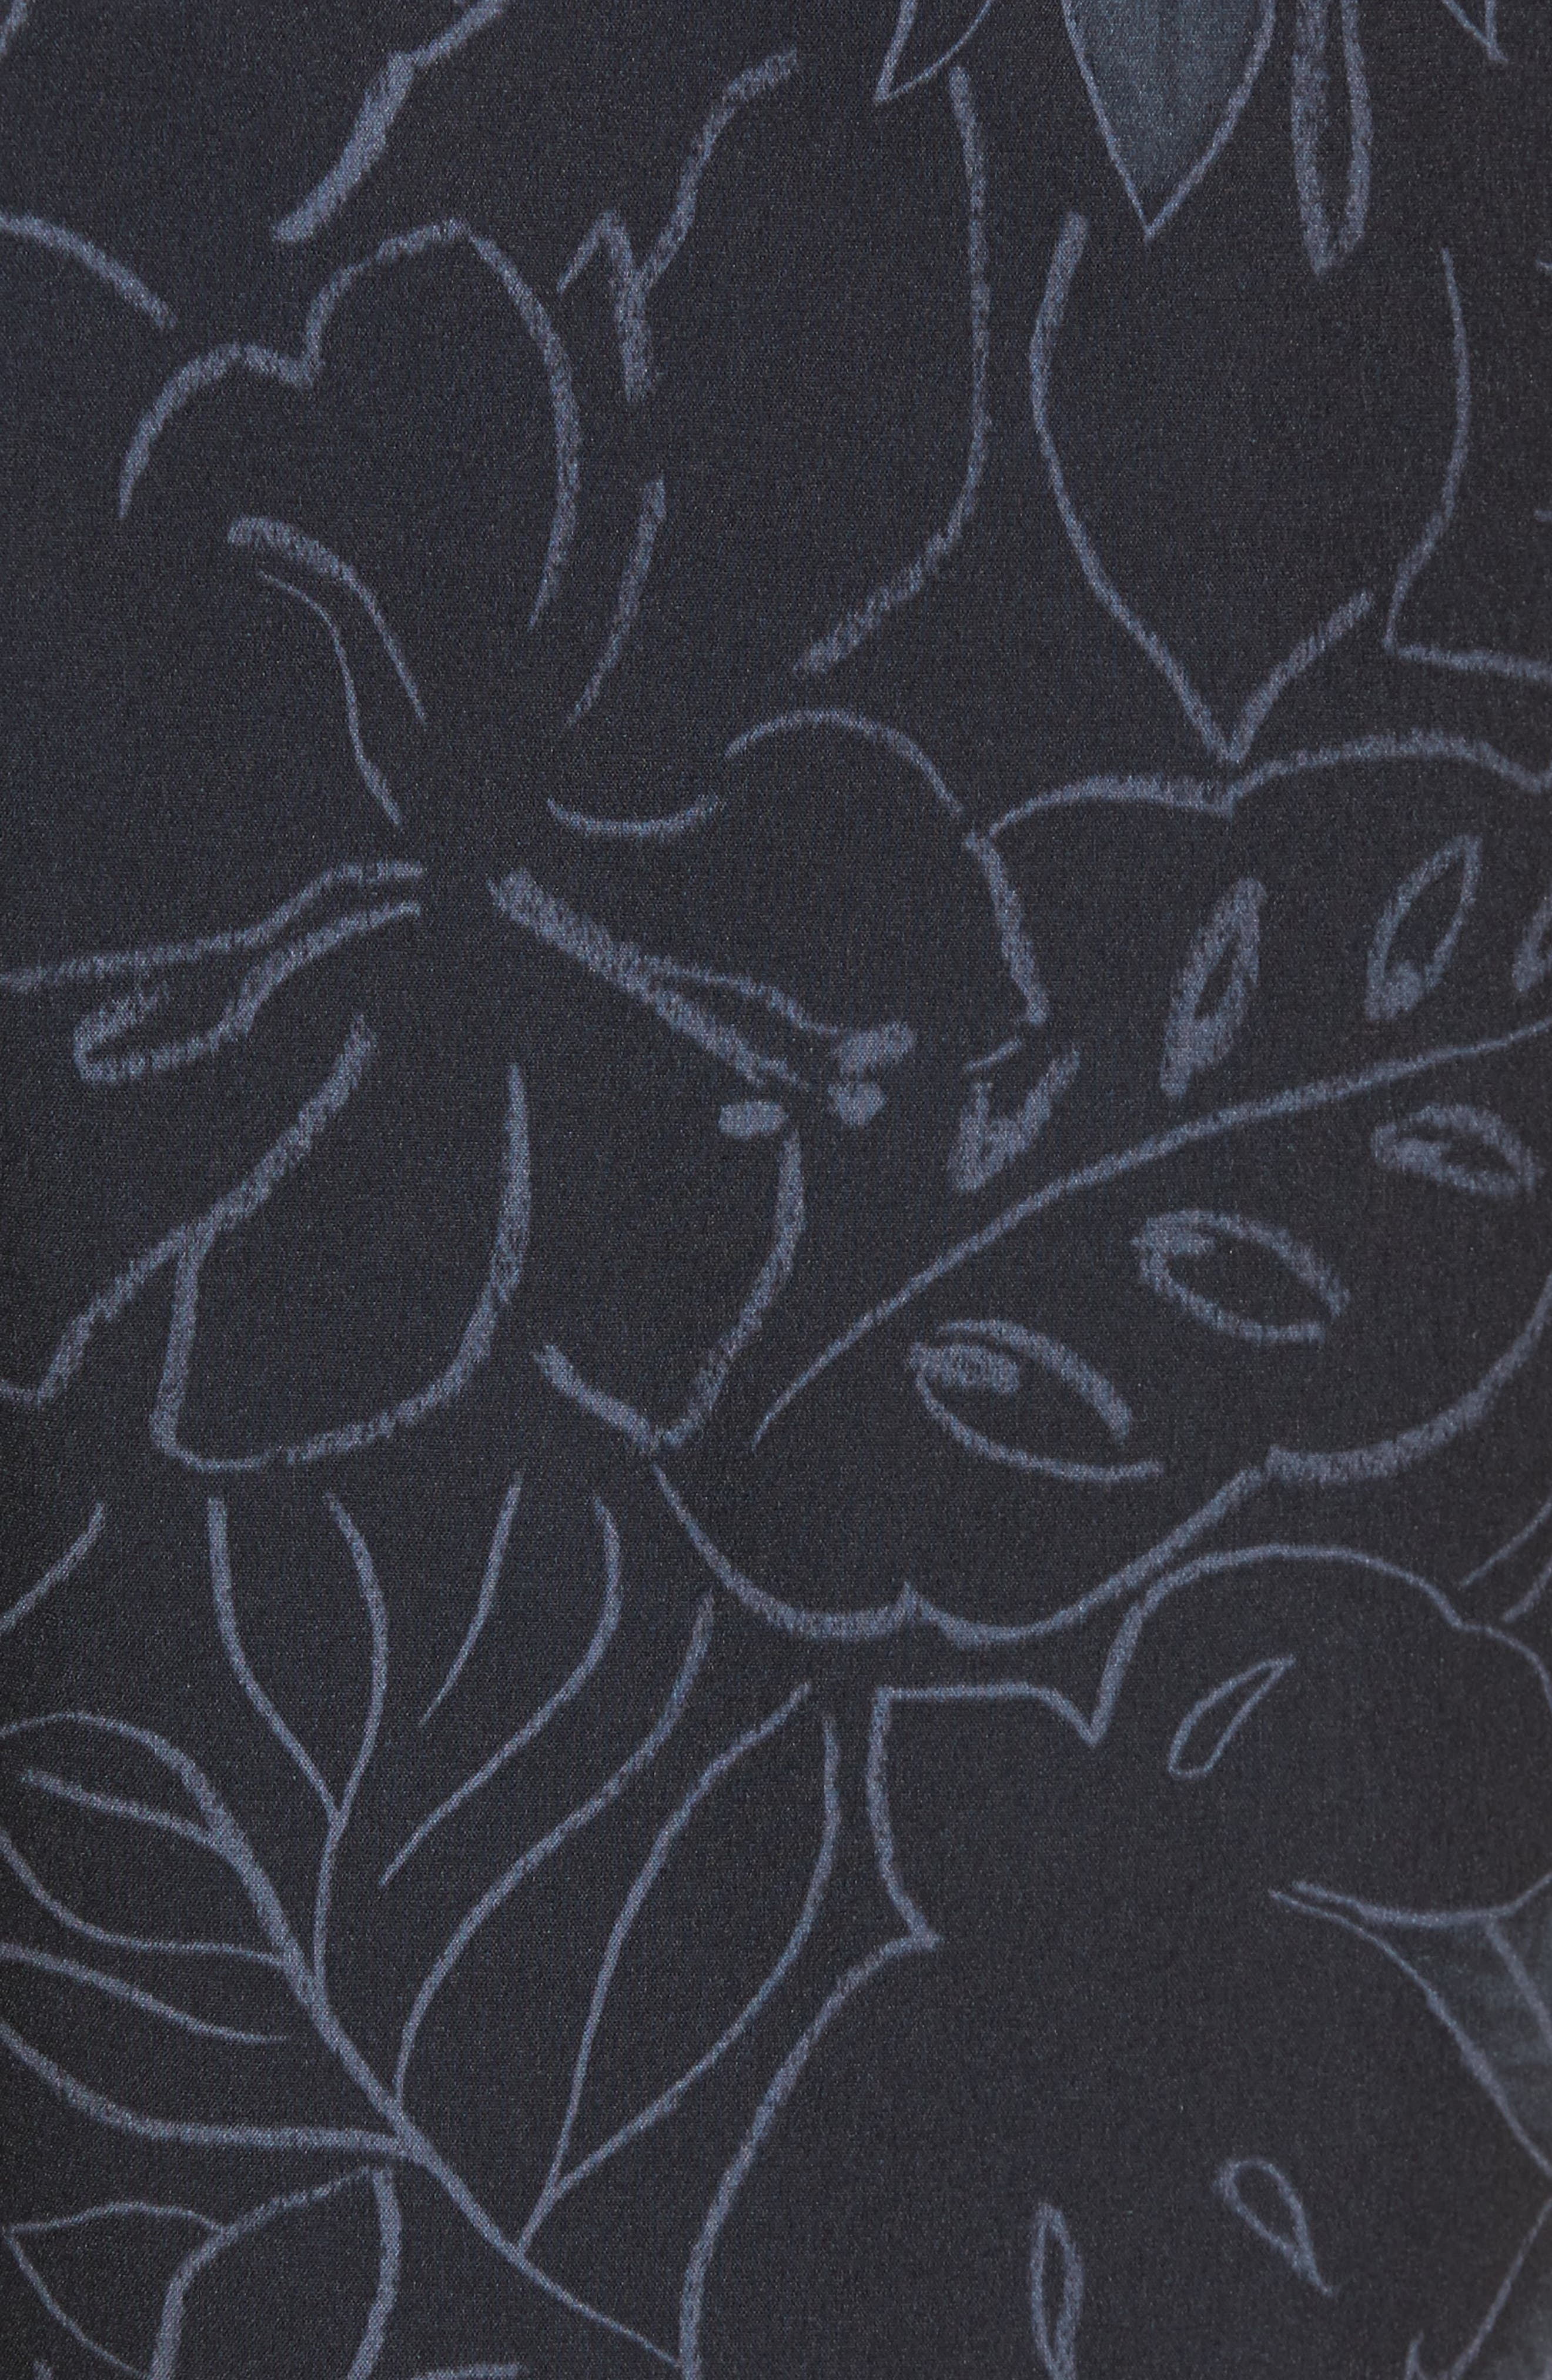 Cayman Sarasota Sketch Swim Trunks,                             Alternate thumbnail 5, color,                             Black